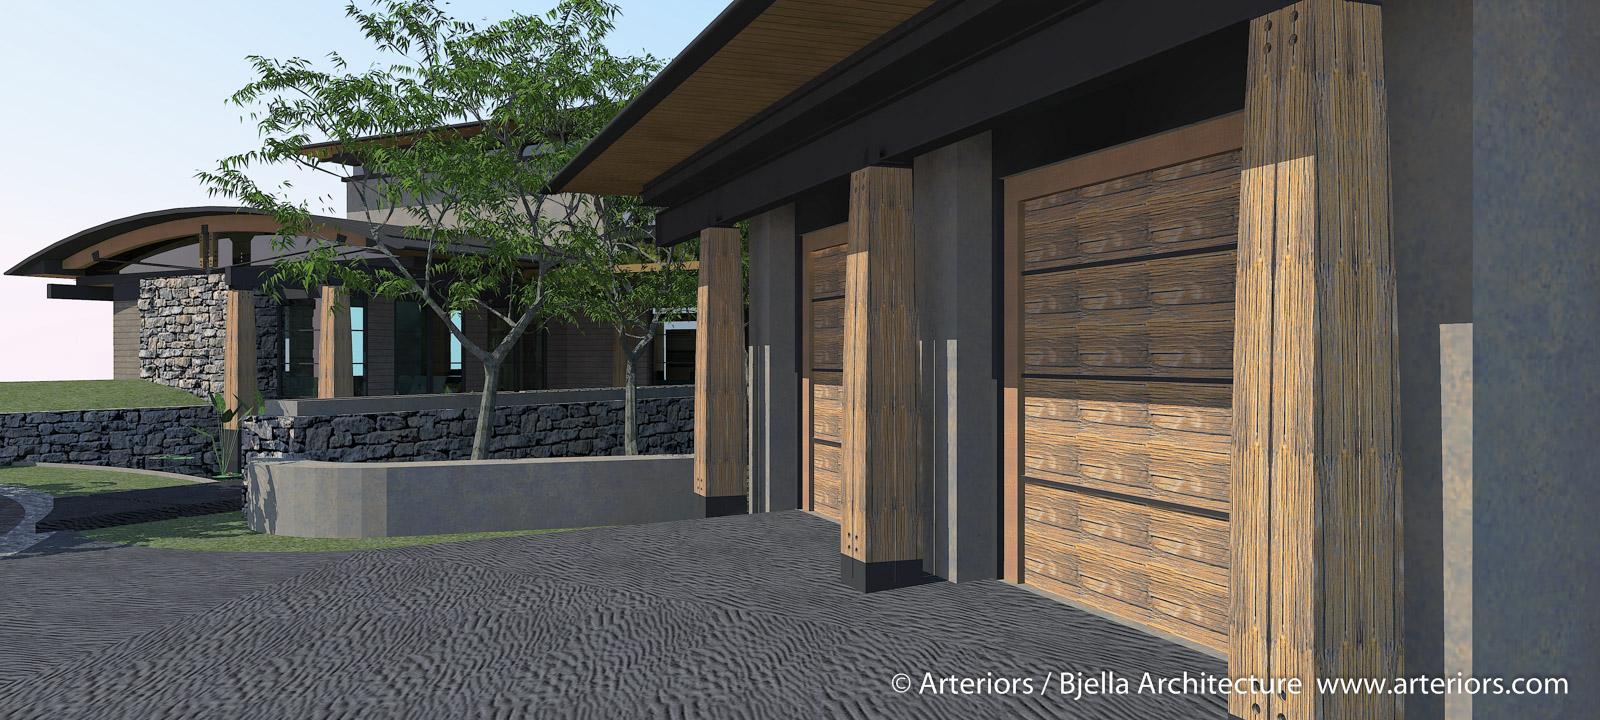 modern-calabasas-home-by-arteriors-architects-bjella-6